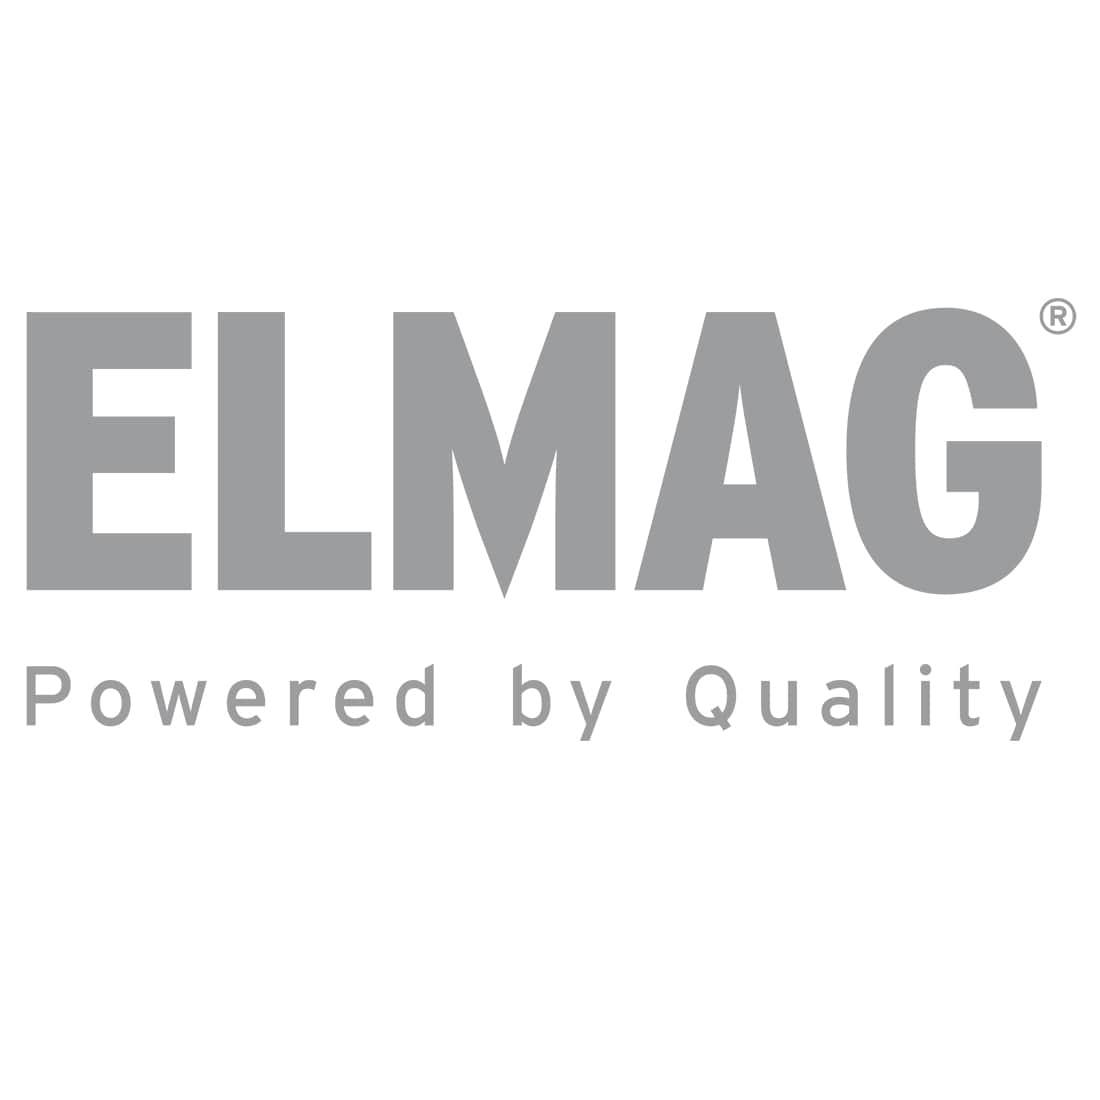 Automatic welding helmet - vegaview 2.5 (1006.600)